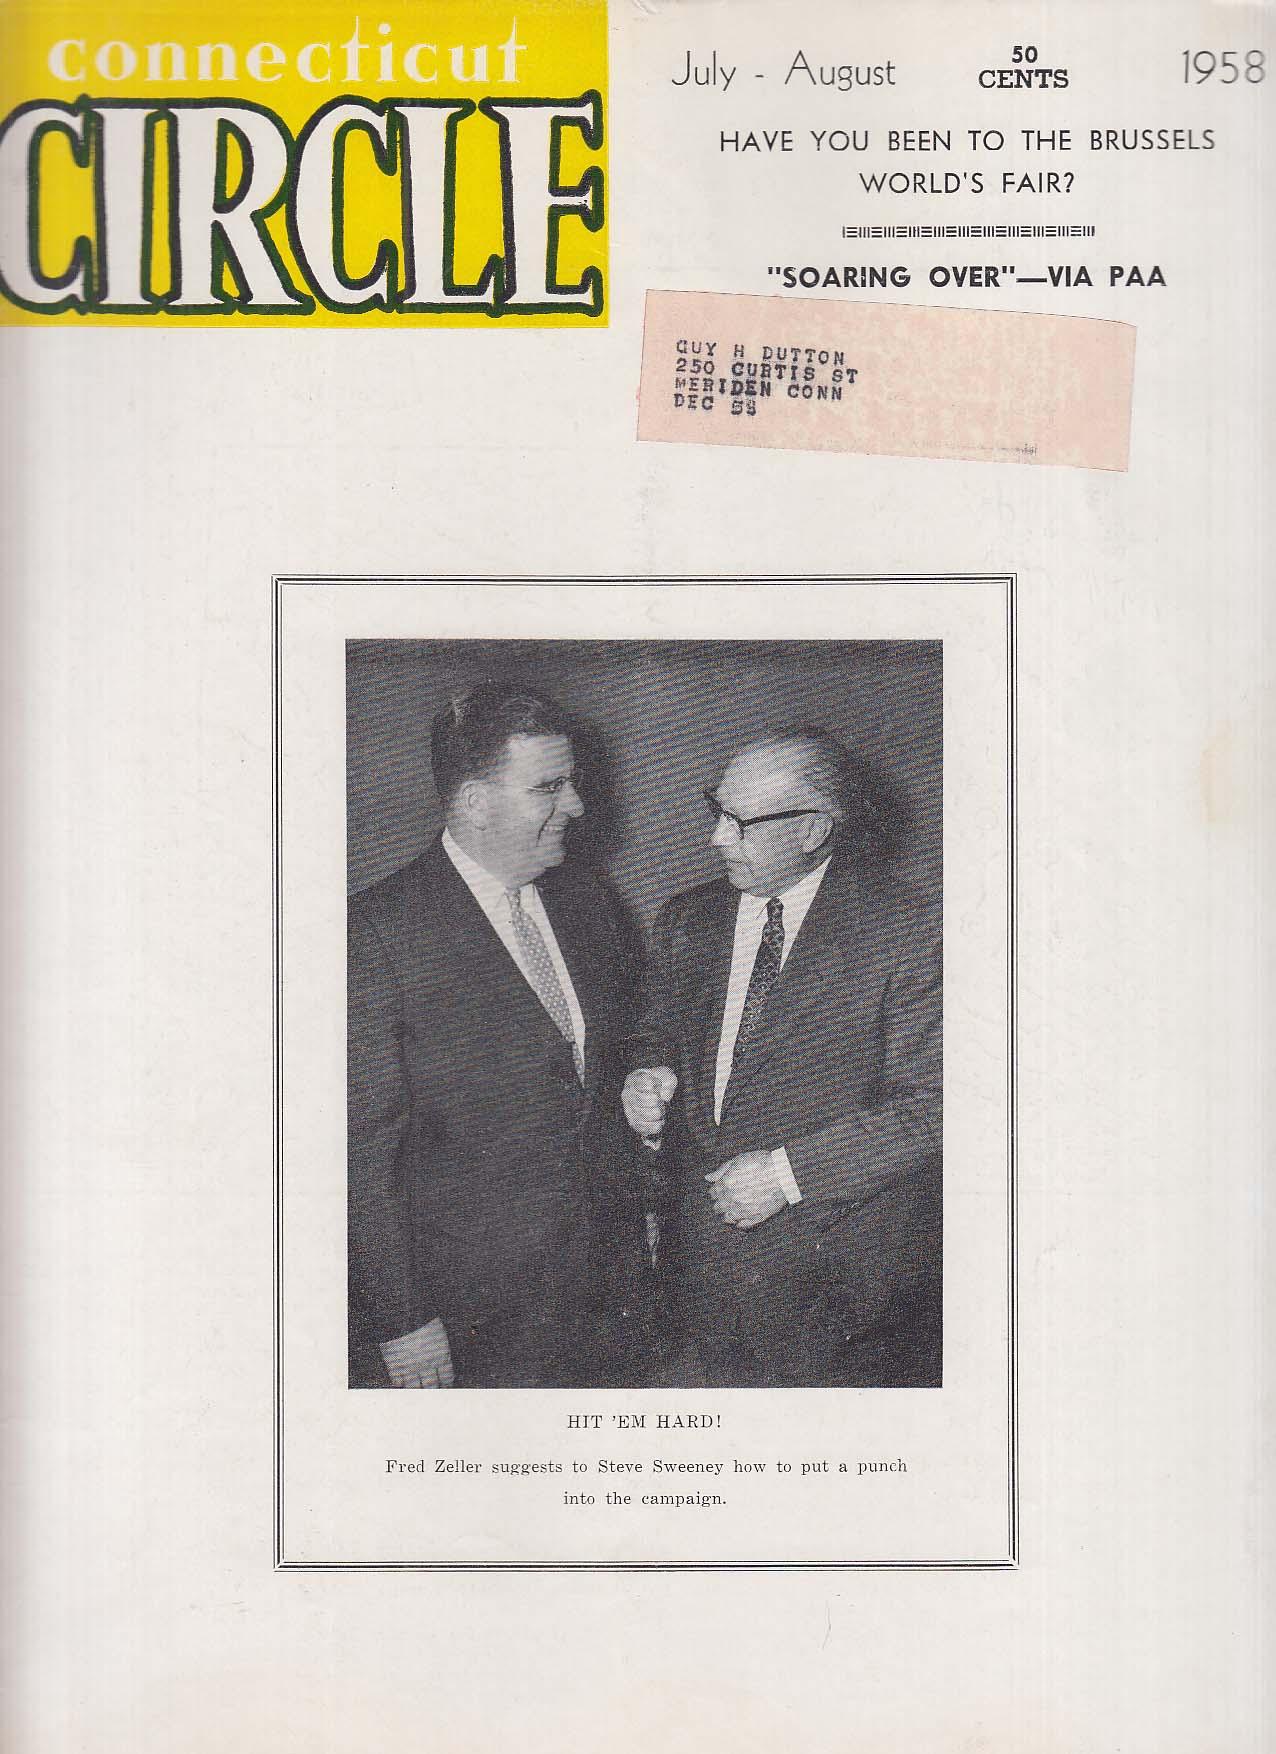 CONNECTICUT CIRCLE Brussels World's Fair Pan Am 7 1958